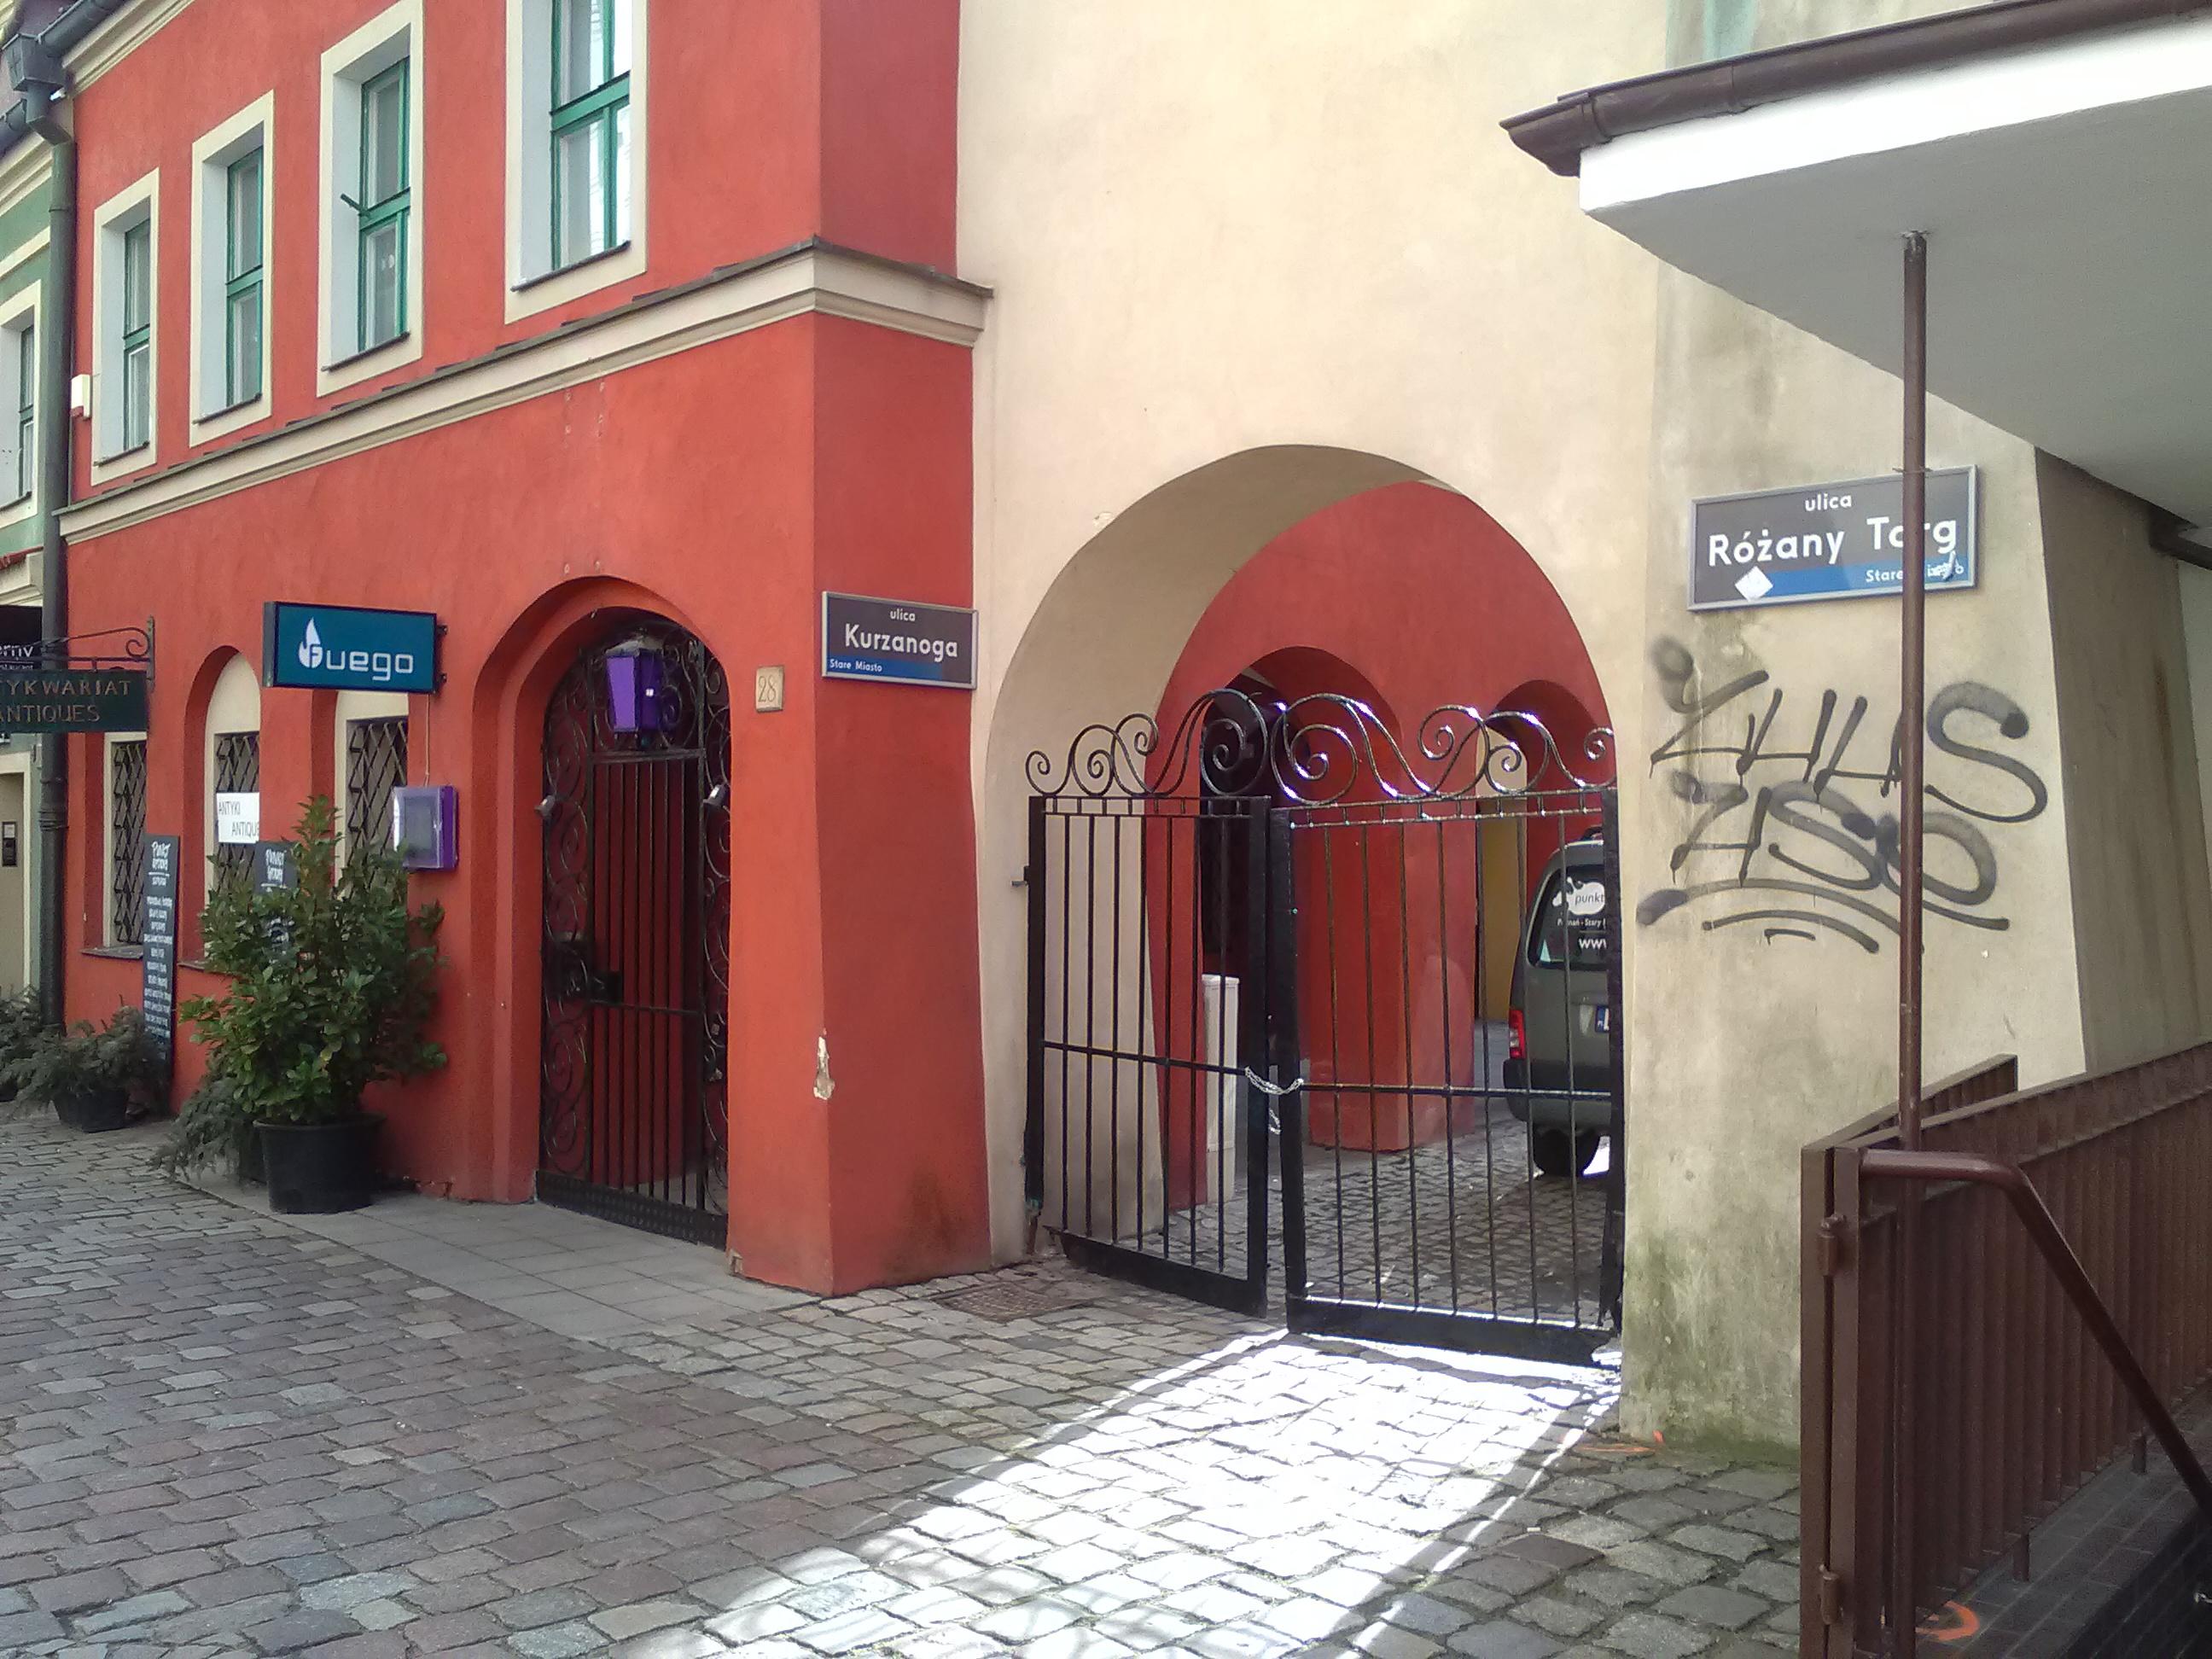 FileUlice Rany Targ I Kurzanoga W Poznaniu